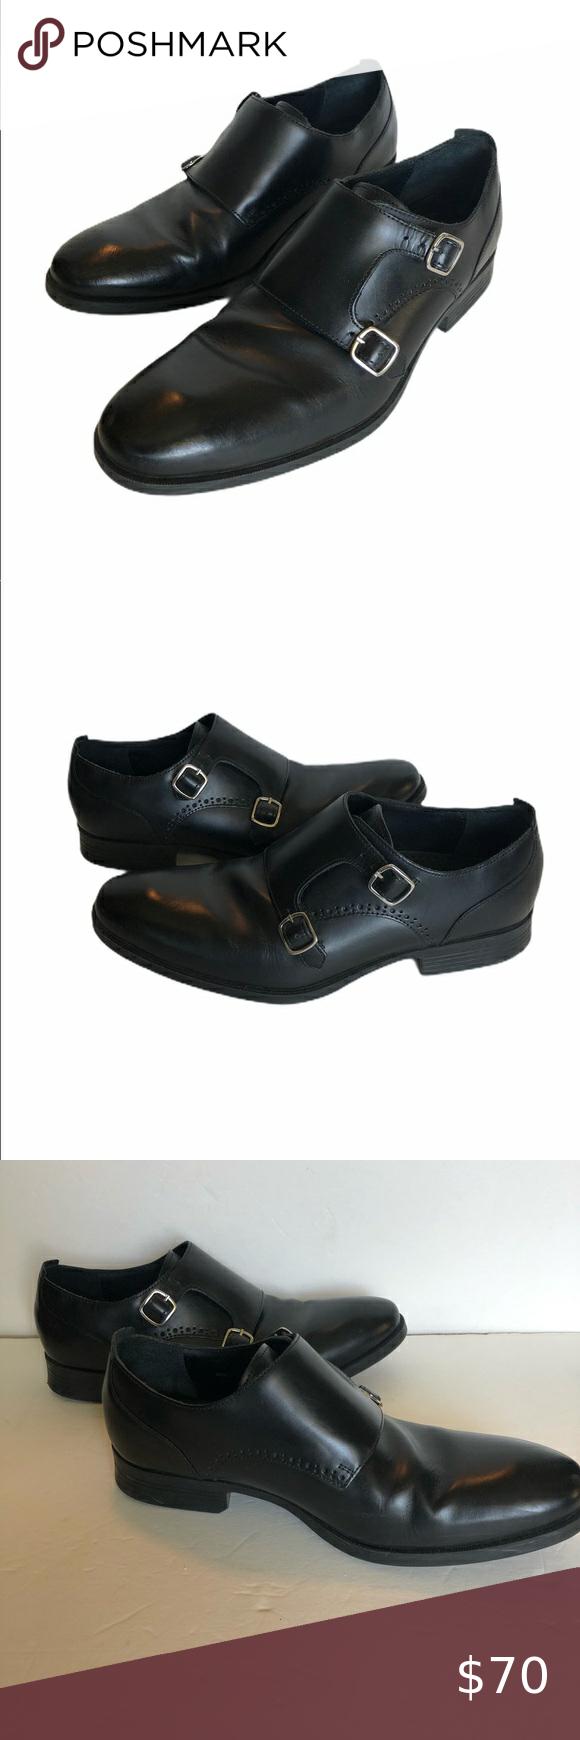 Cole Haan Warner Grand Monk Black Dress Shoes Black Dress Shoes Cole Haan Shoes Dress Shoes [ 1740 x 580 Pixel ]